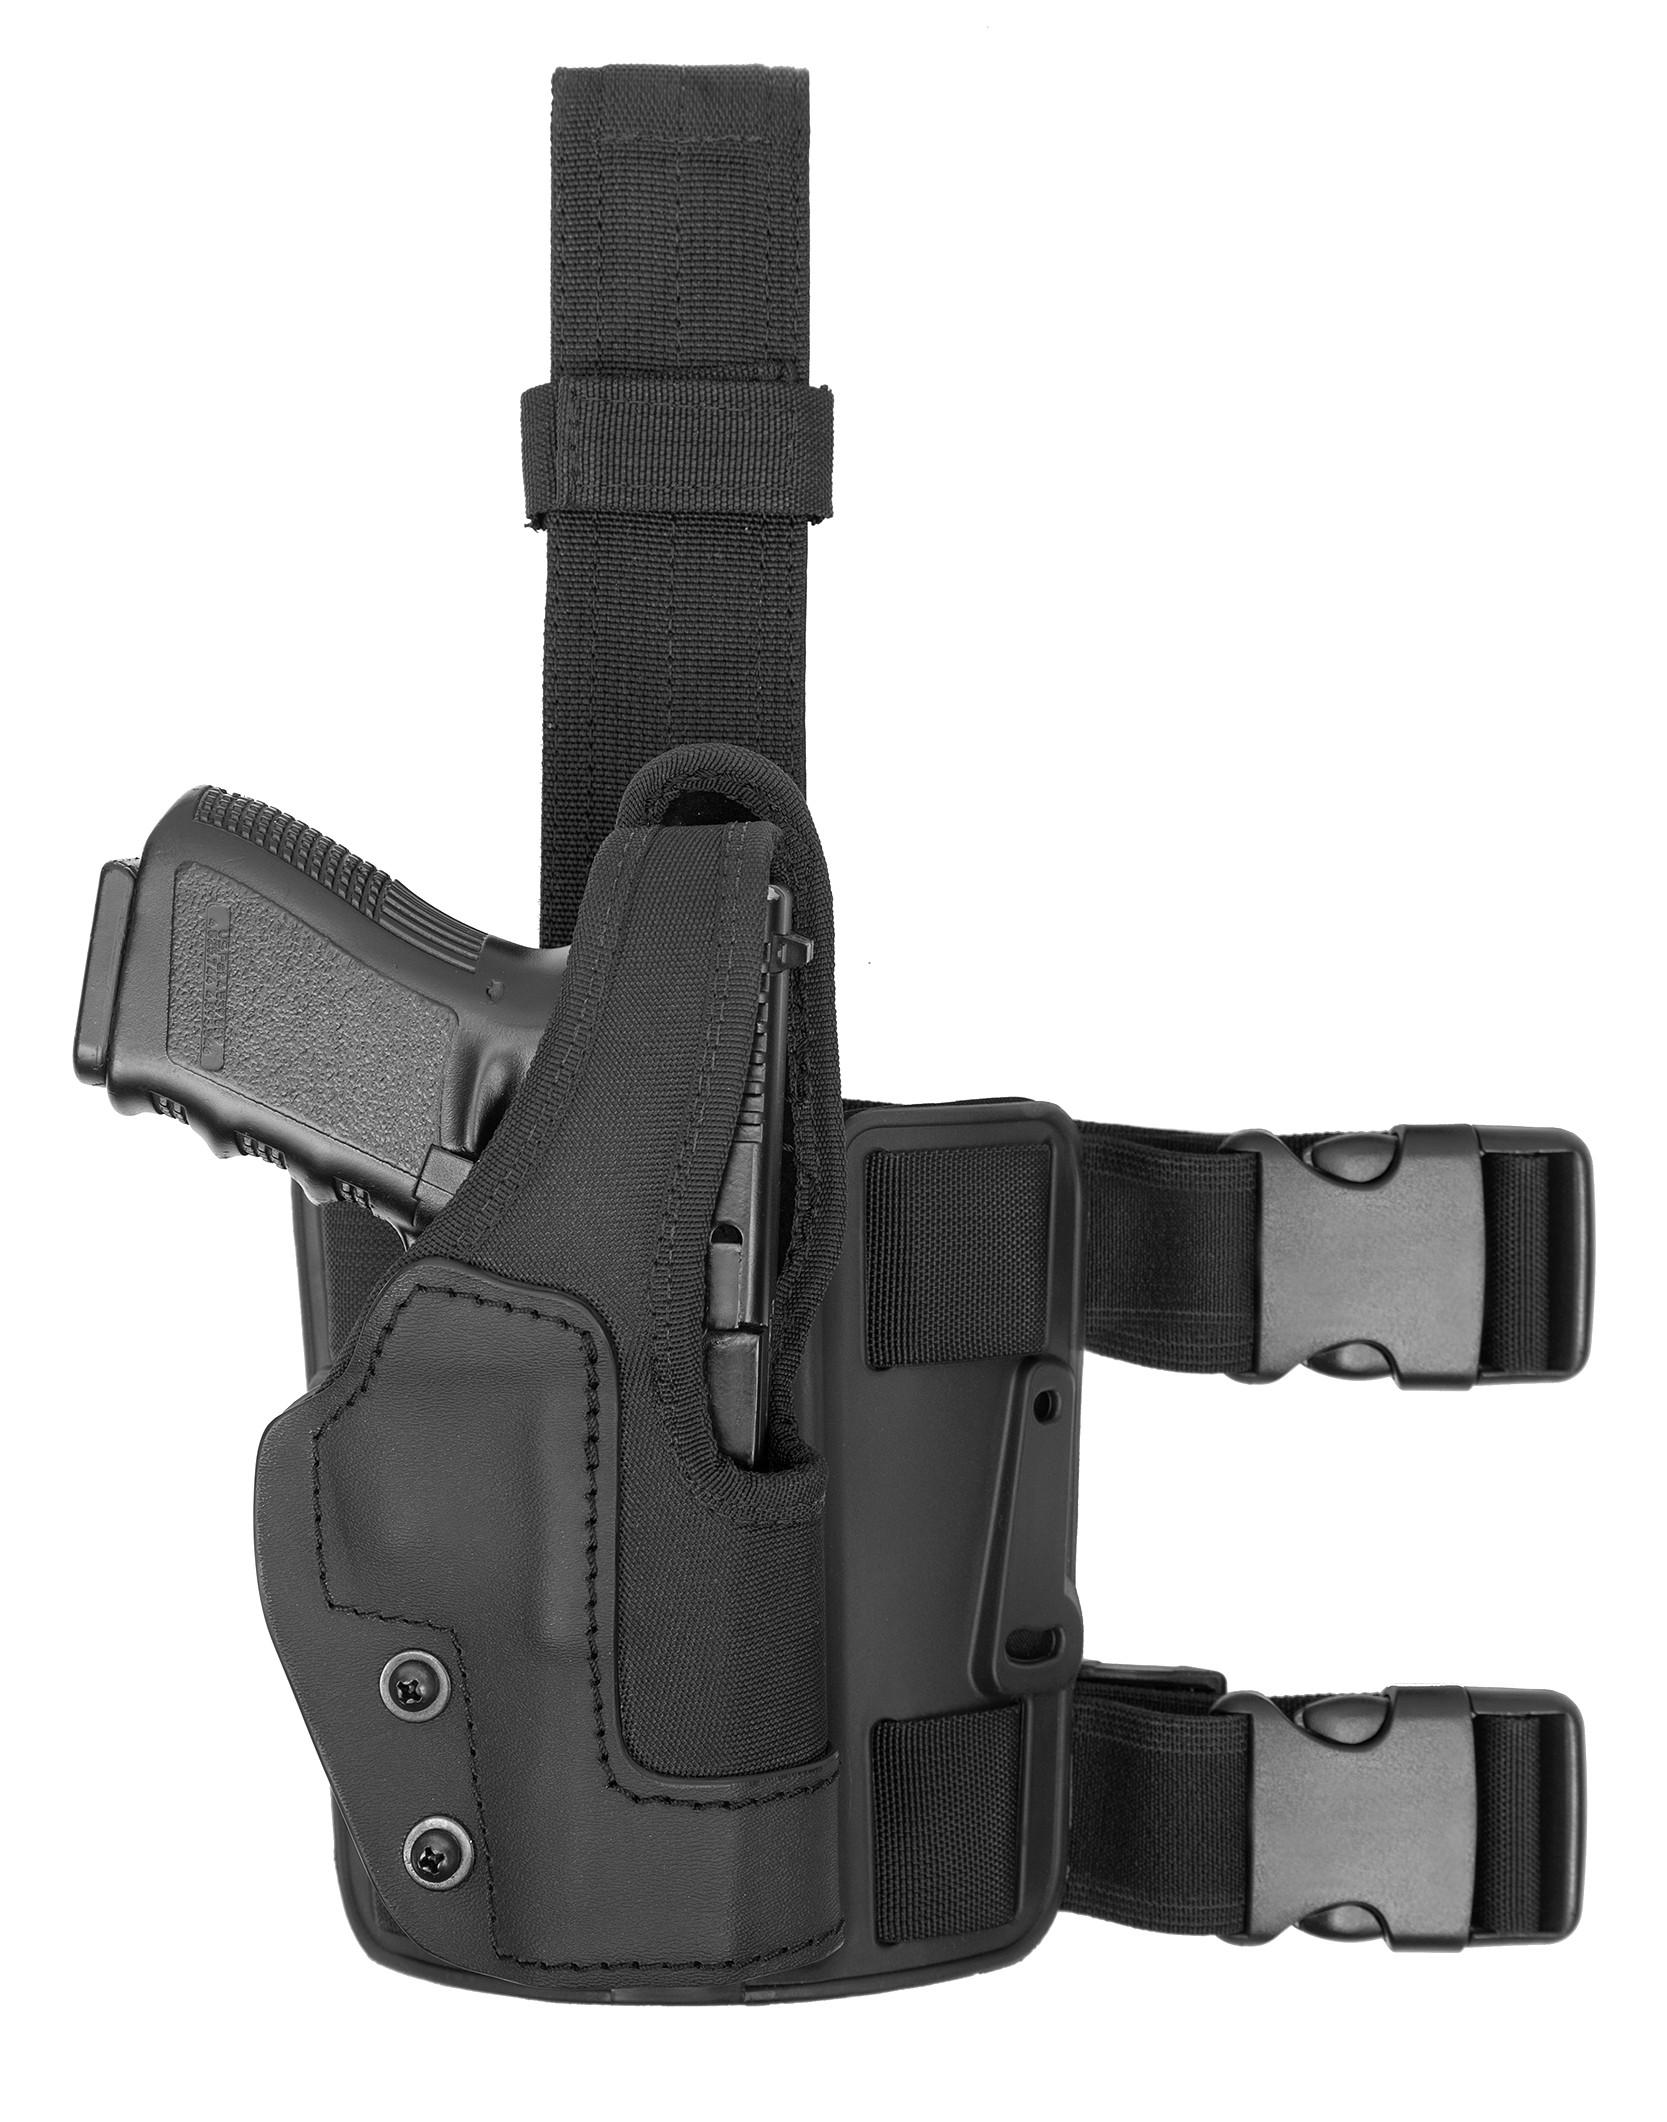 Thumb-break KNG Tactical Holster - Level II